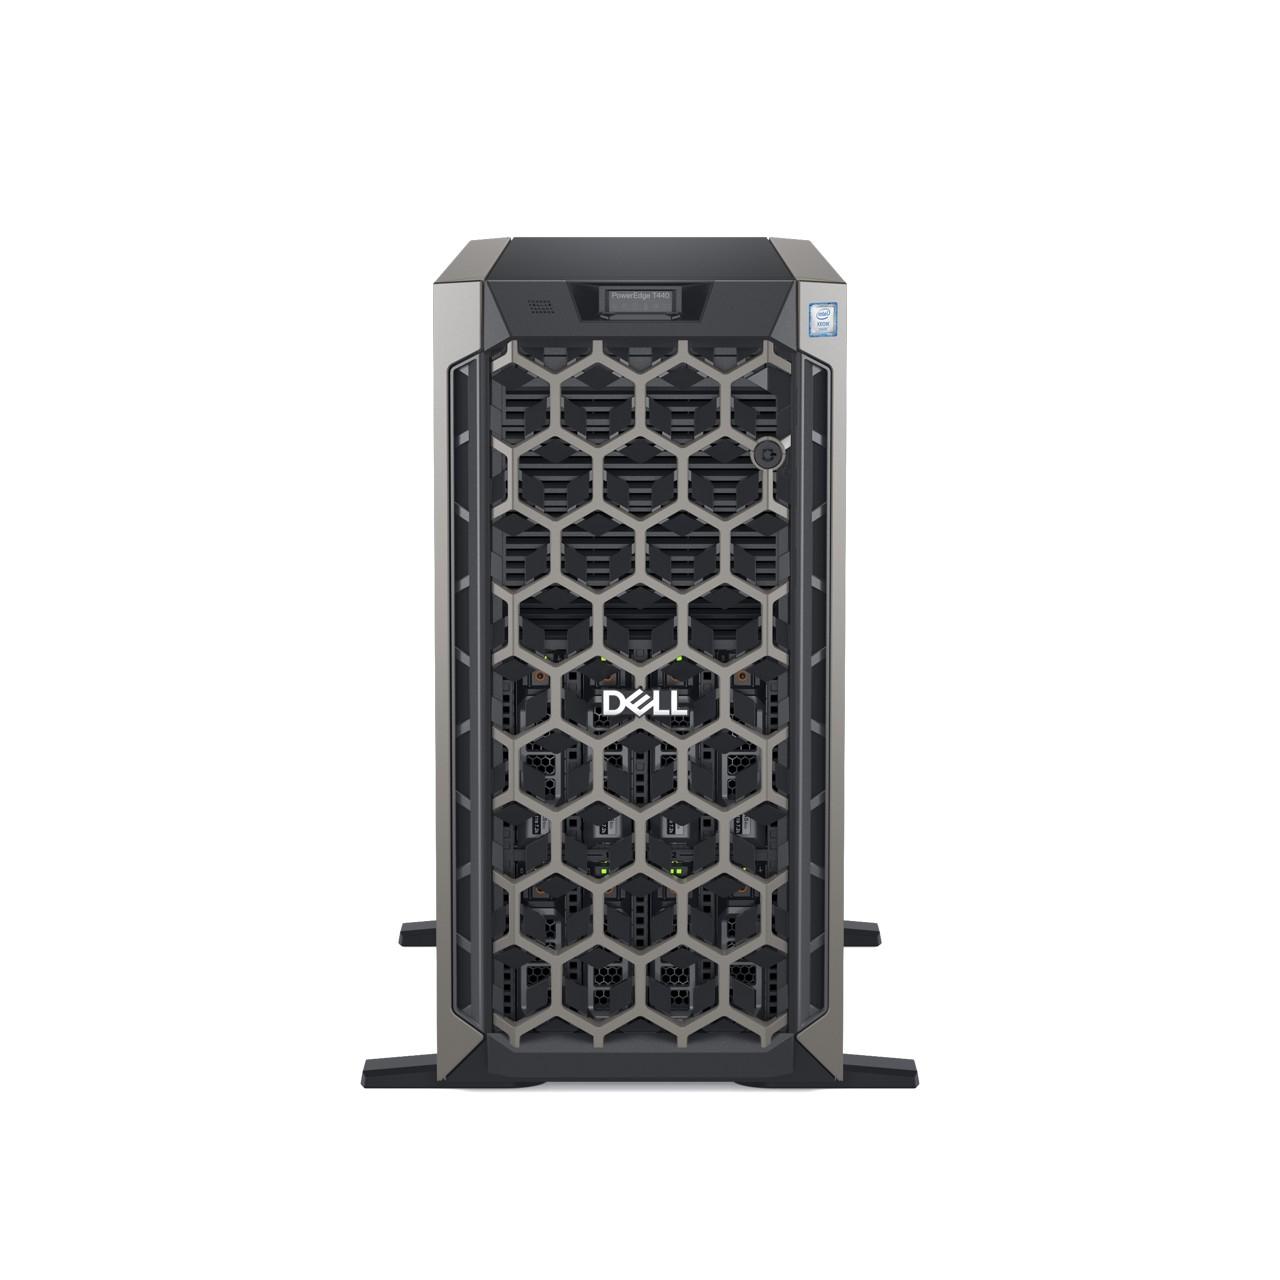 DELL PowerEdge T440 2.1GHz 4110 495W Tower (5U) server